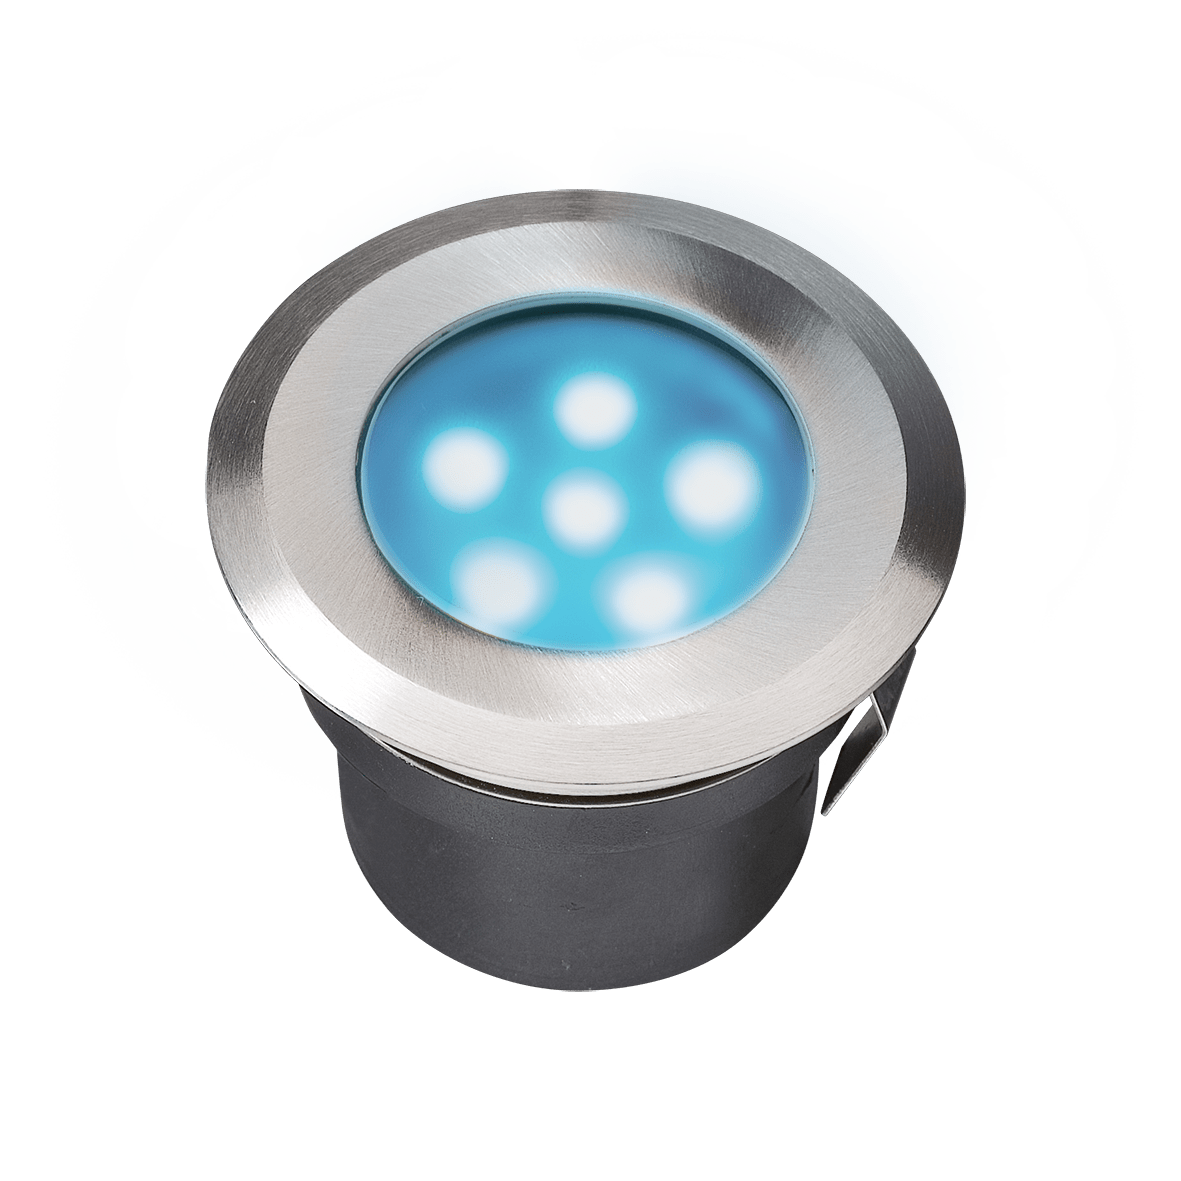 Garden Lights Tuinverlichting Sirius Blauw 12V LED | Stijlvolle Tuinlamp